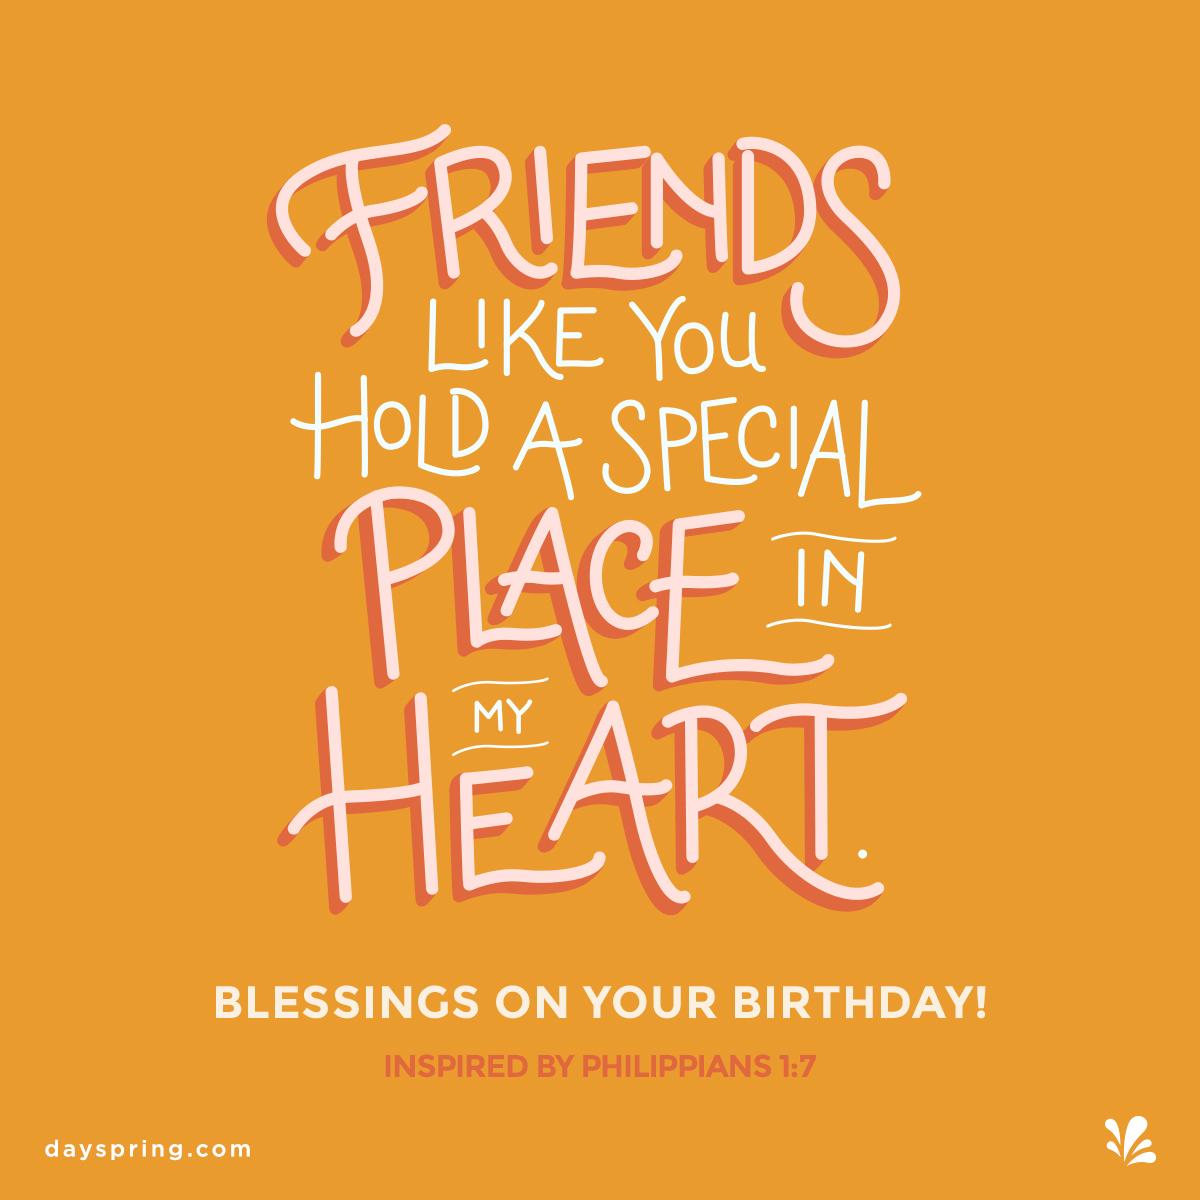 Birthday Ecards | Dayspring - Free Printable Christian Birthday Greeting Cards